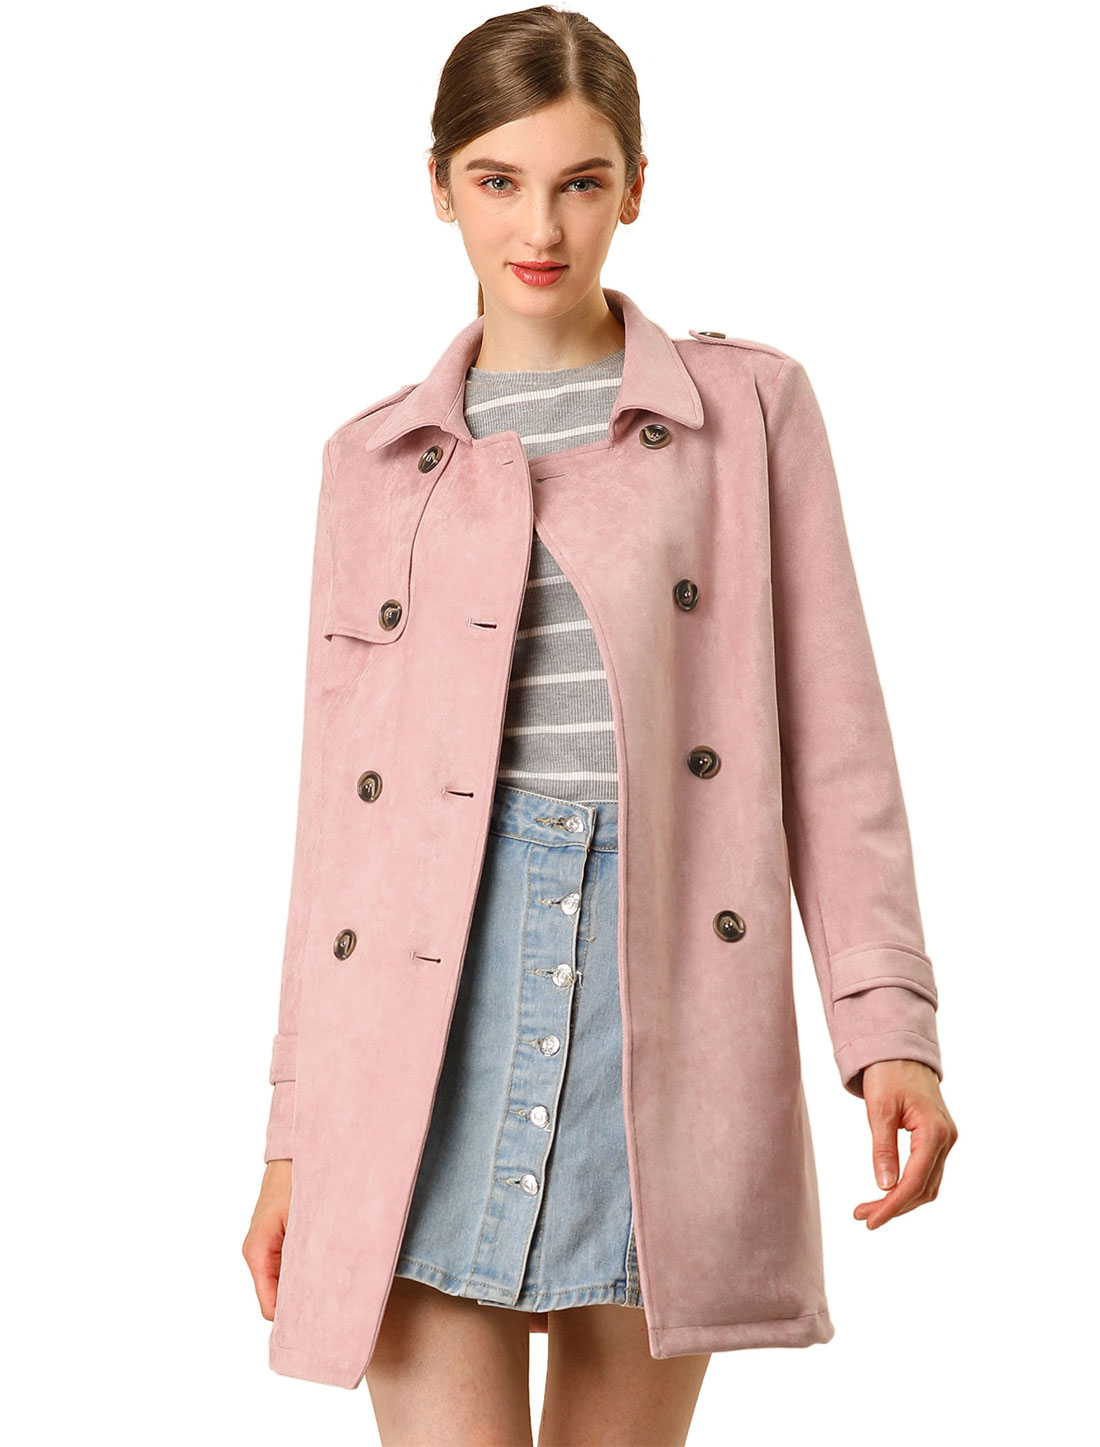 Allegra K Women Faux Suede Trench Coat Jacket with Belt Pink S